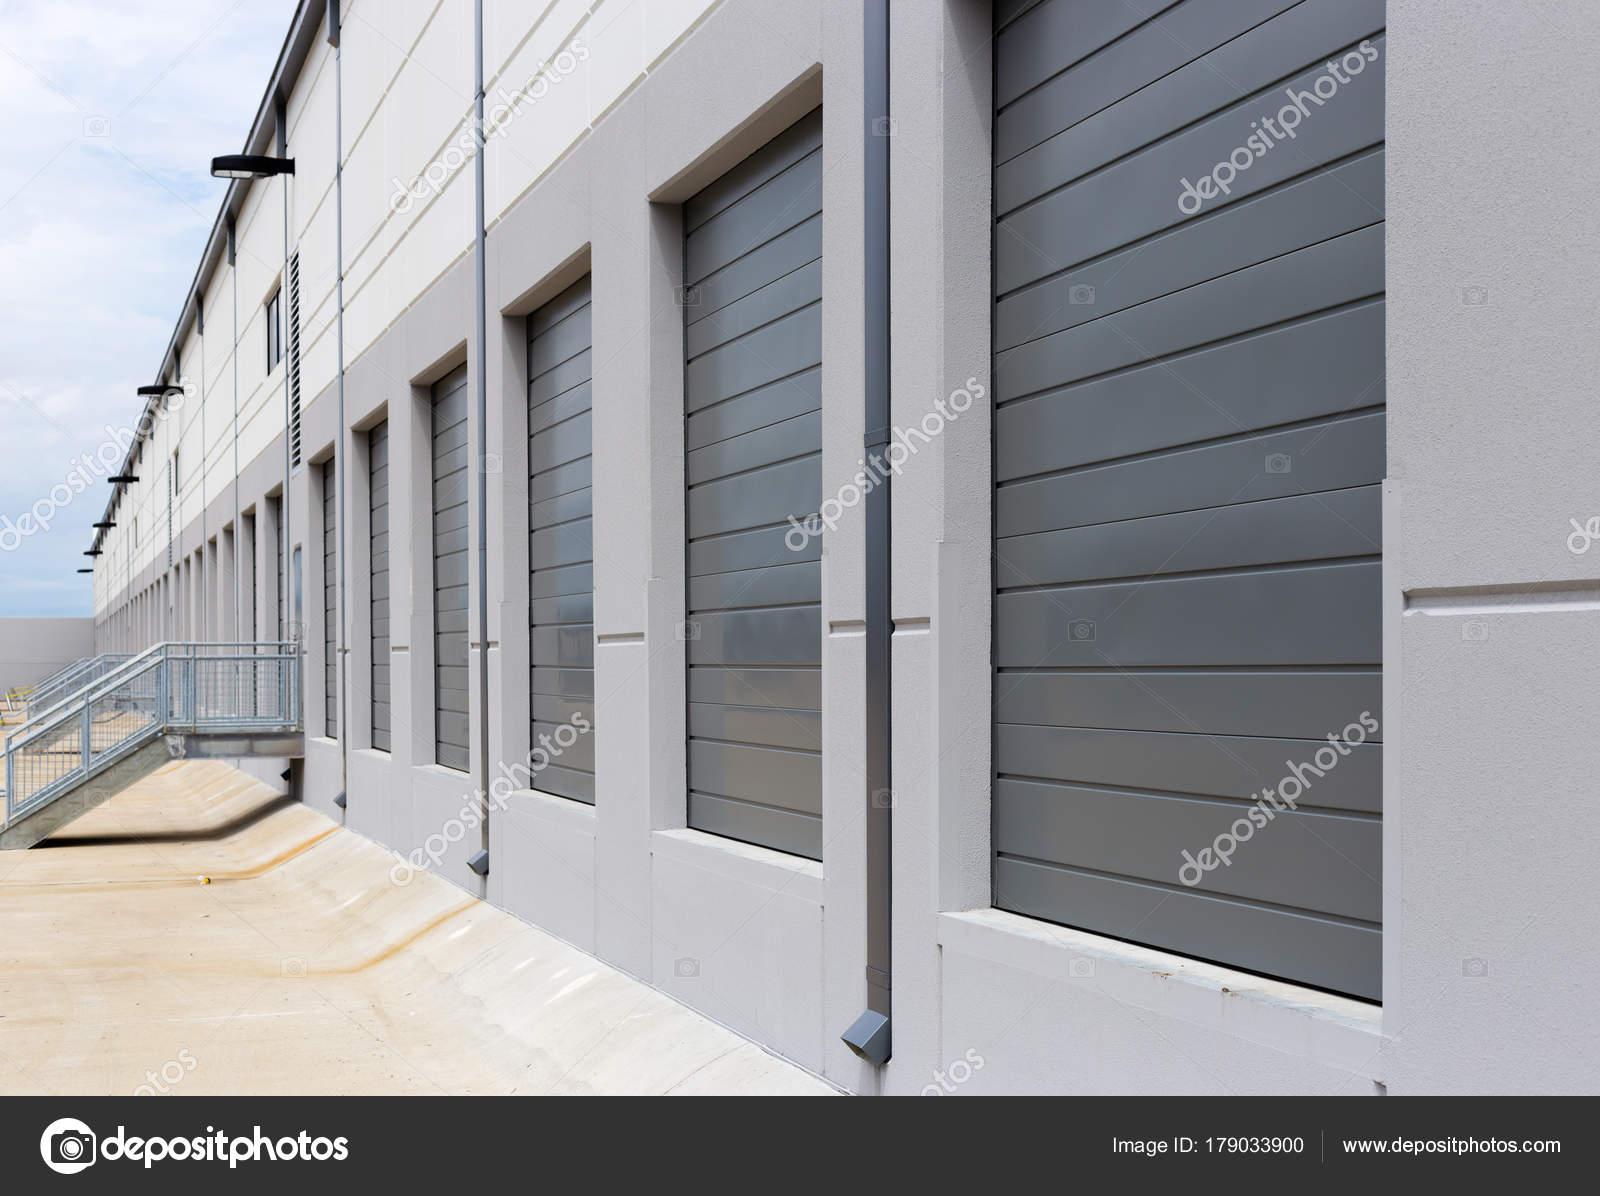 New Construction Warehouse Loading Dock White Walls Gray Metal S